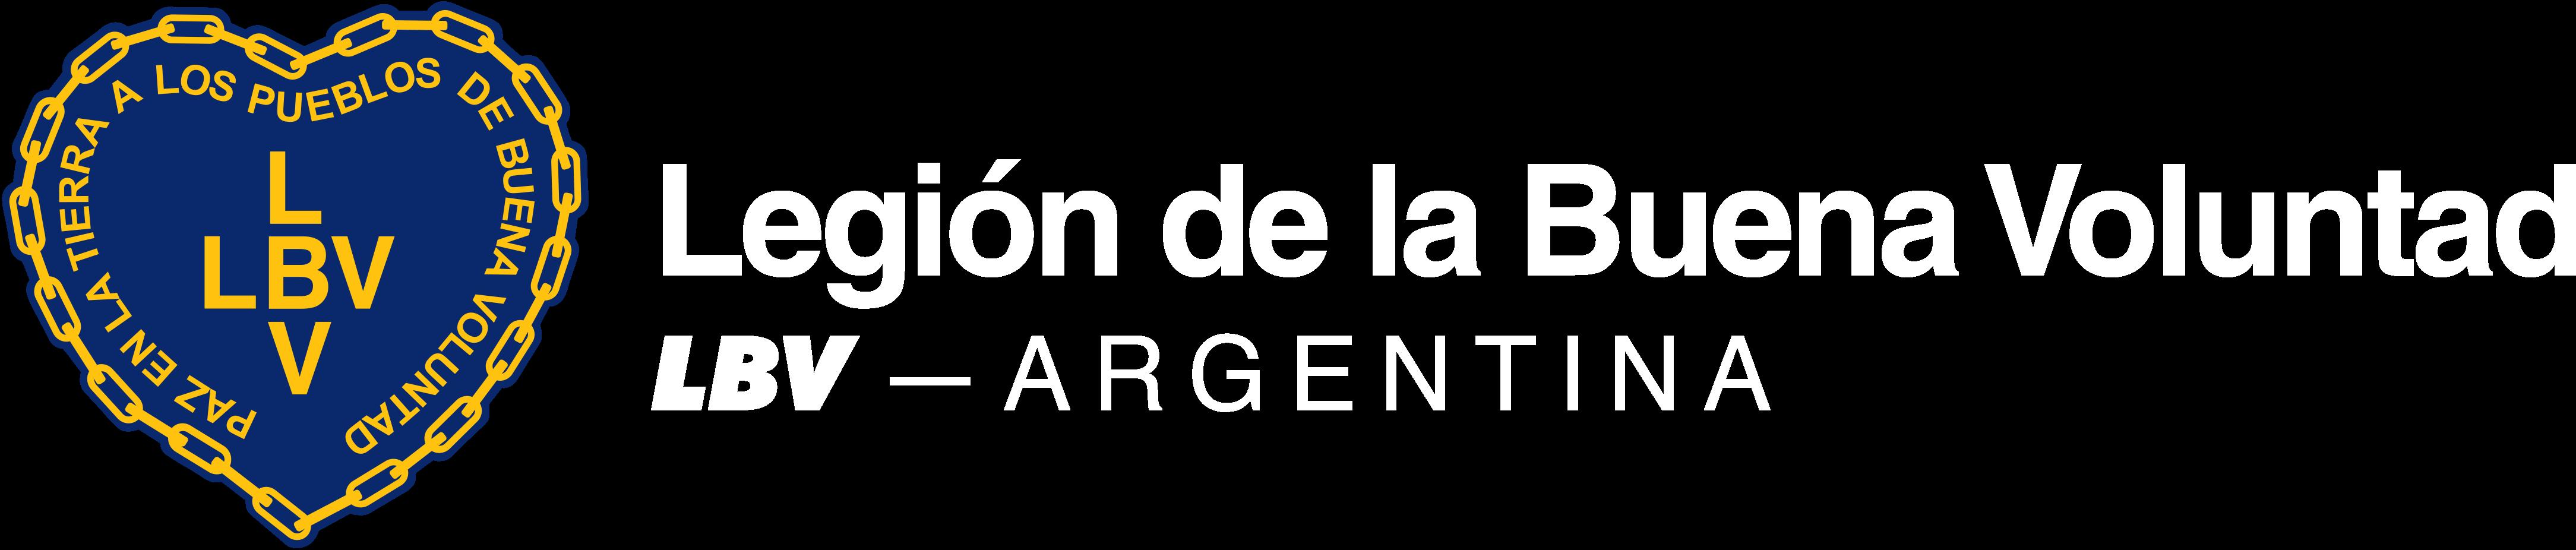 LBV - Argentina